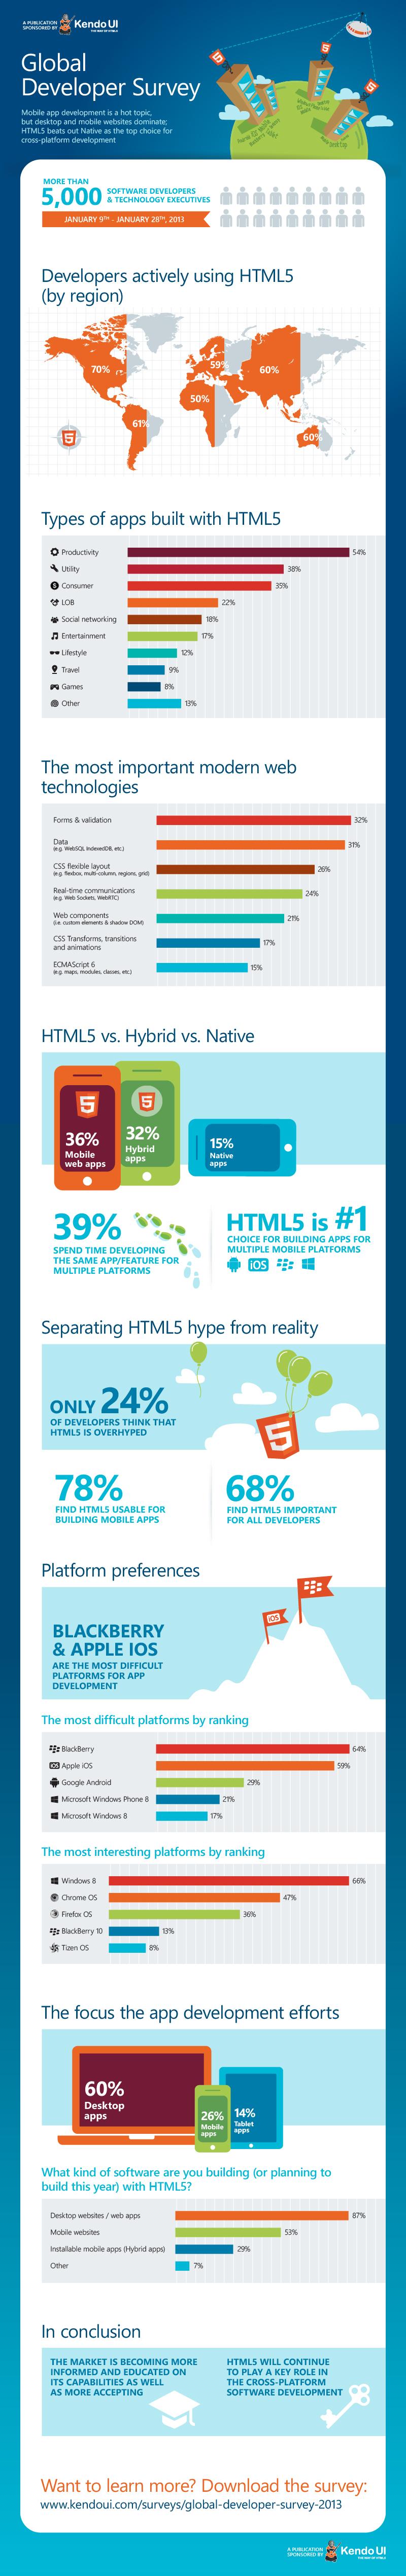 Kendo UI_HTML5 Global Developer Survey_Infographic